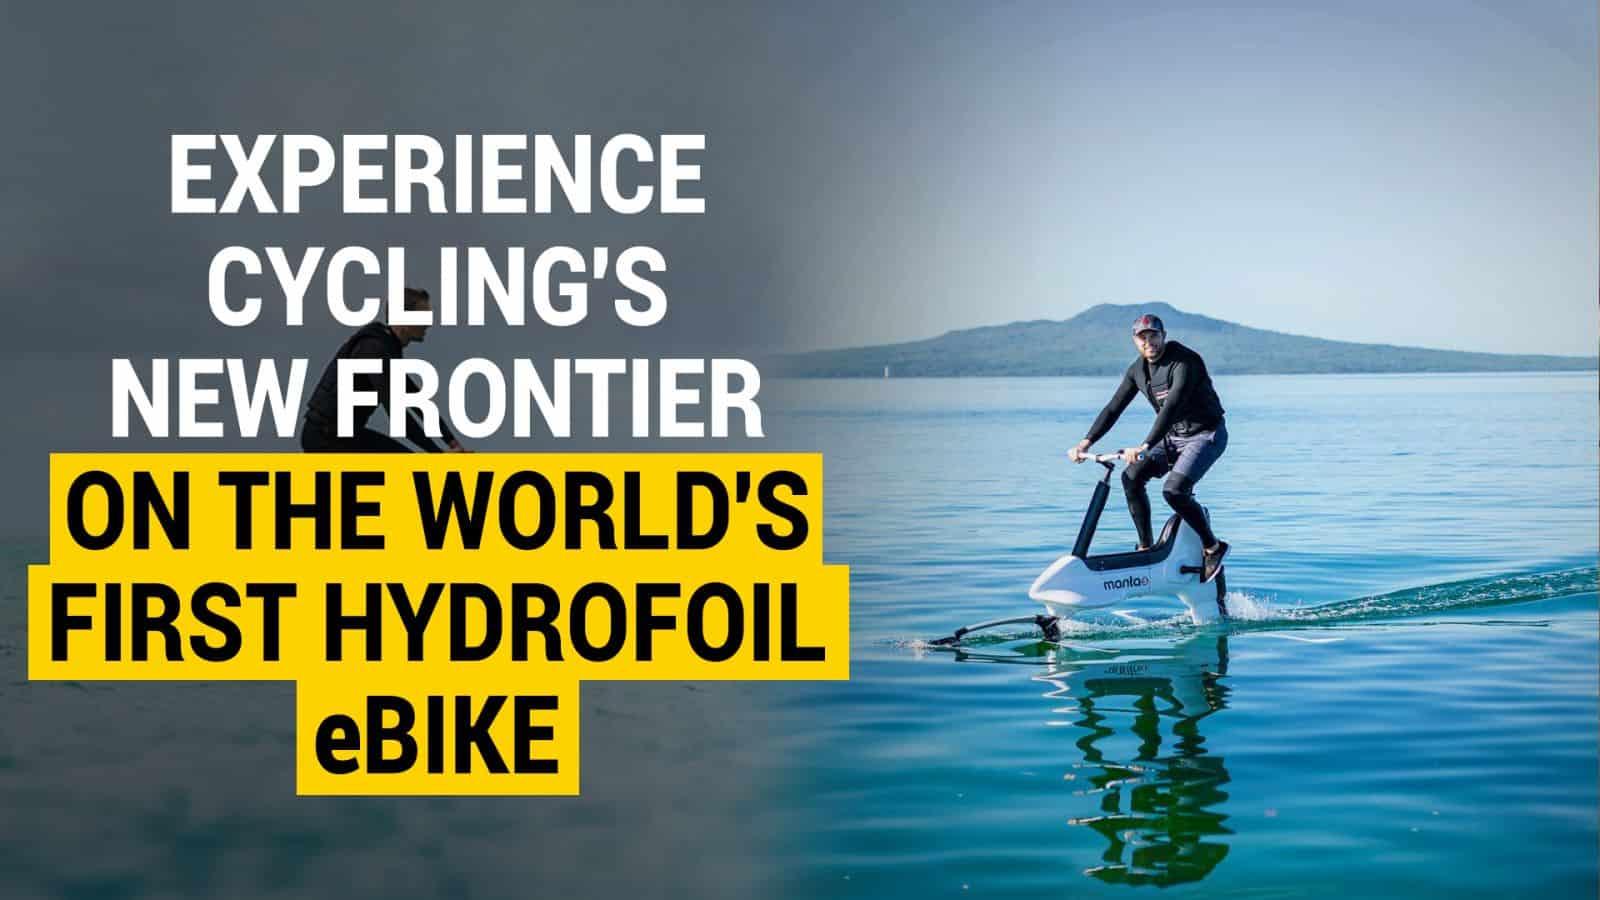 hydrofoil bike